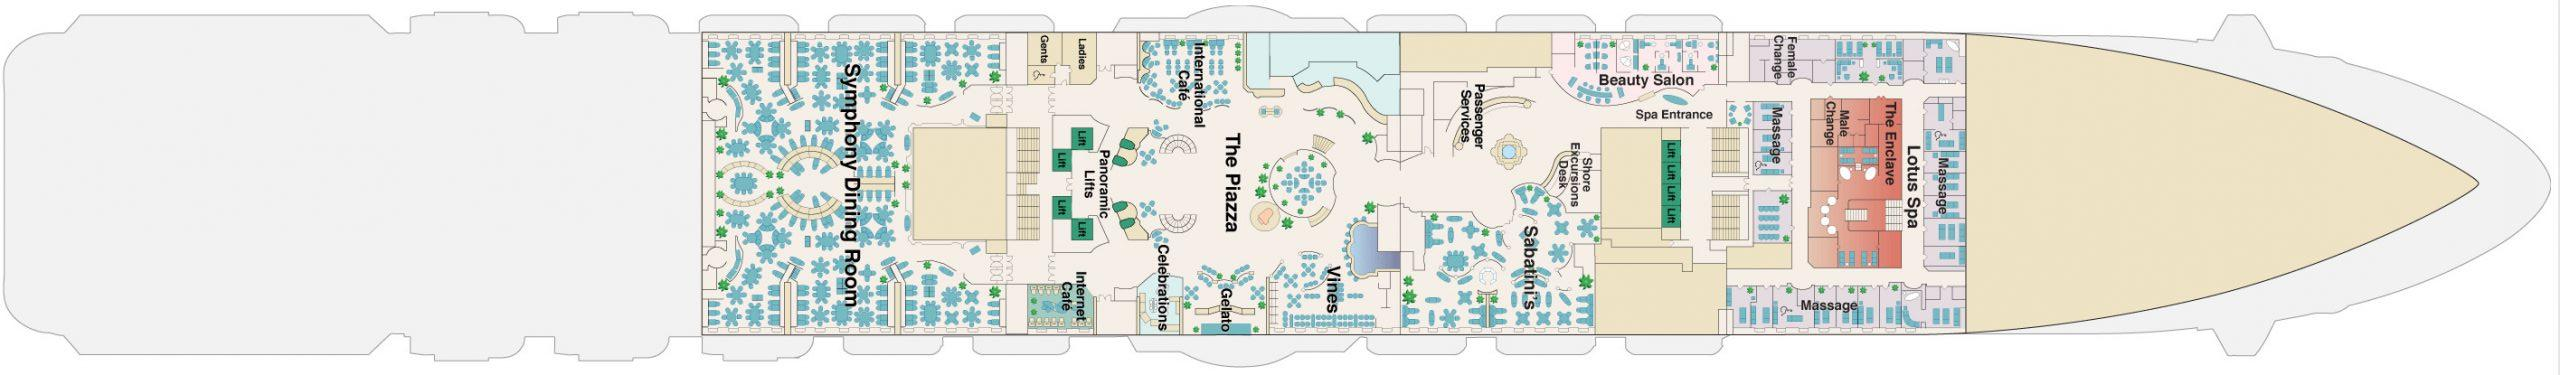 Deck 5 – Plaza